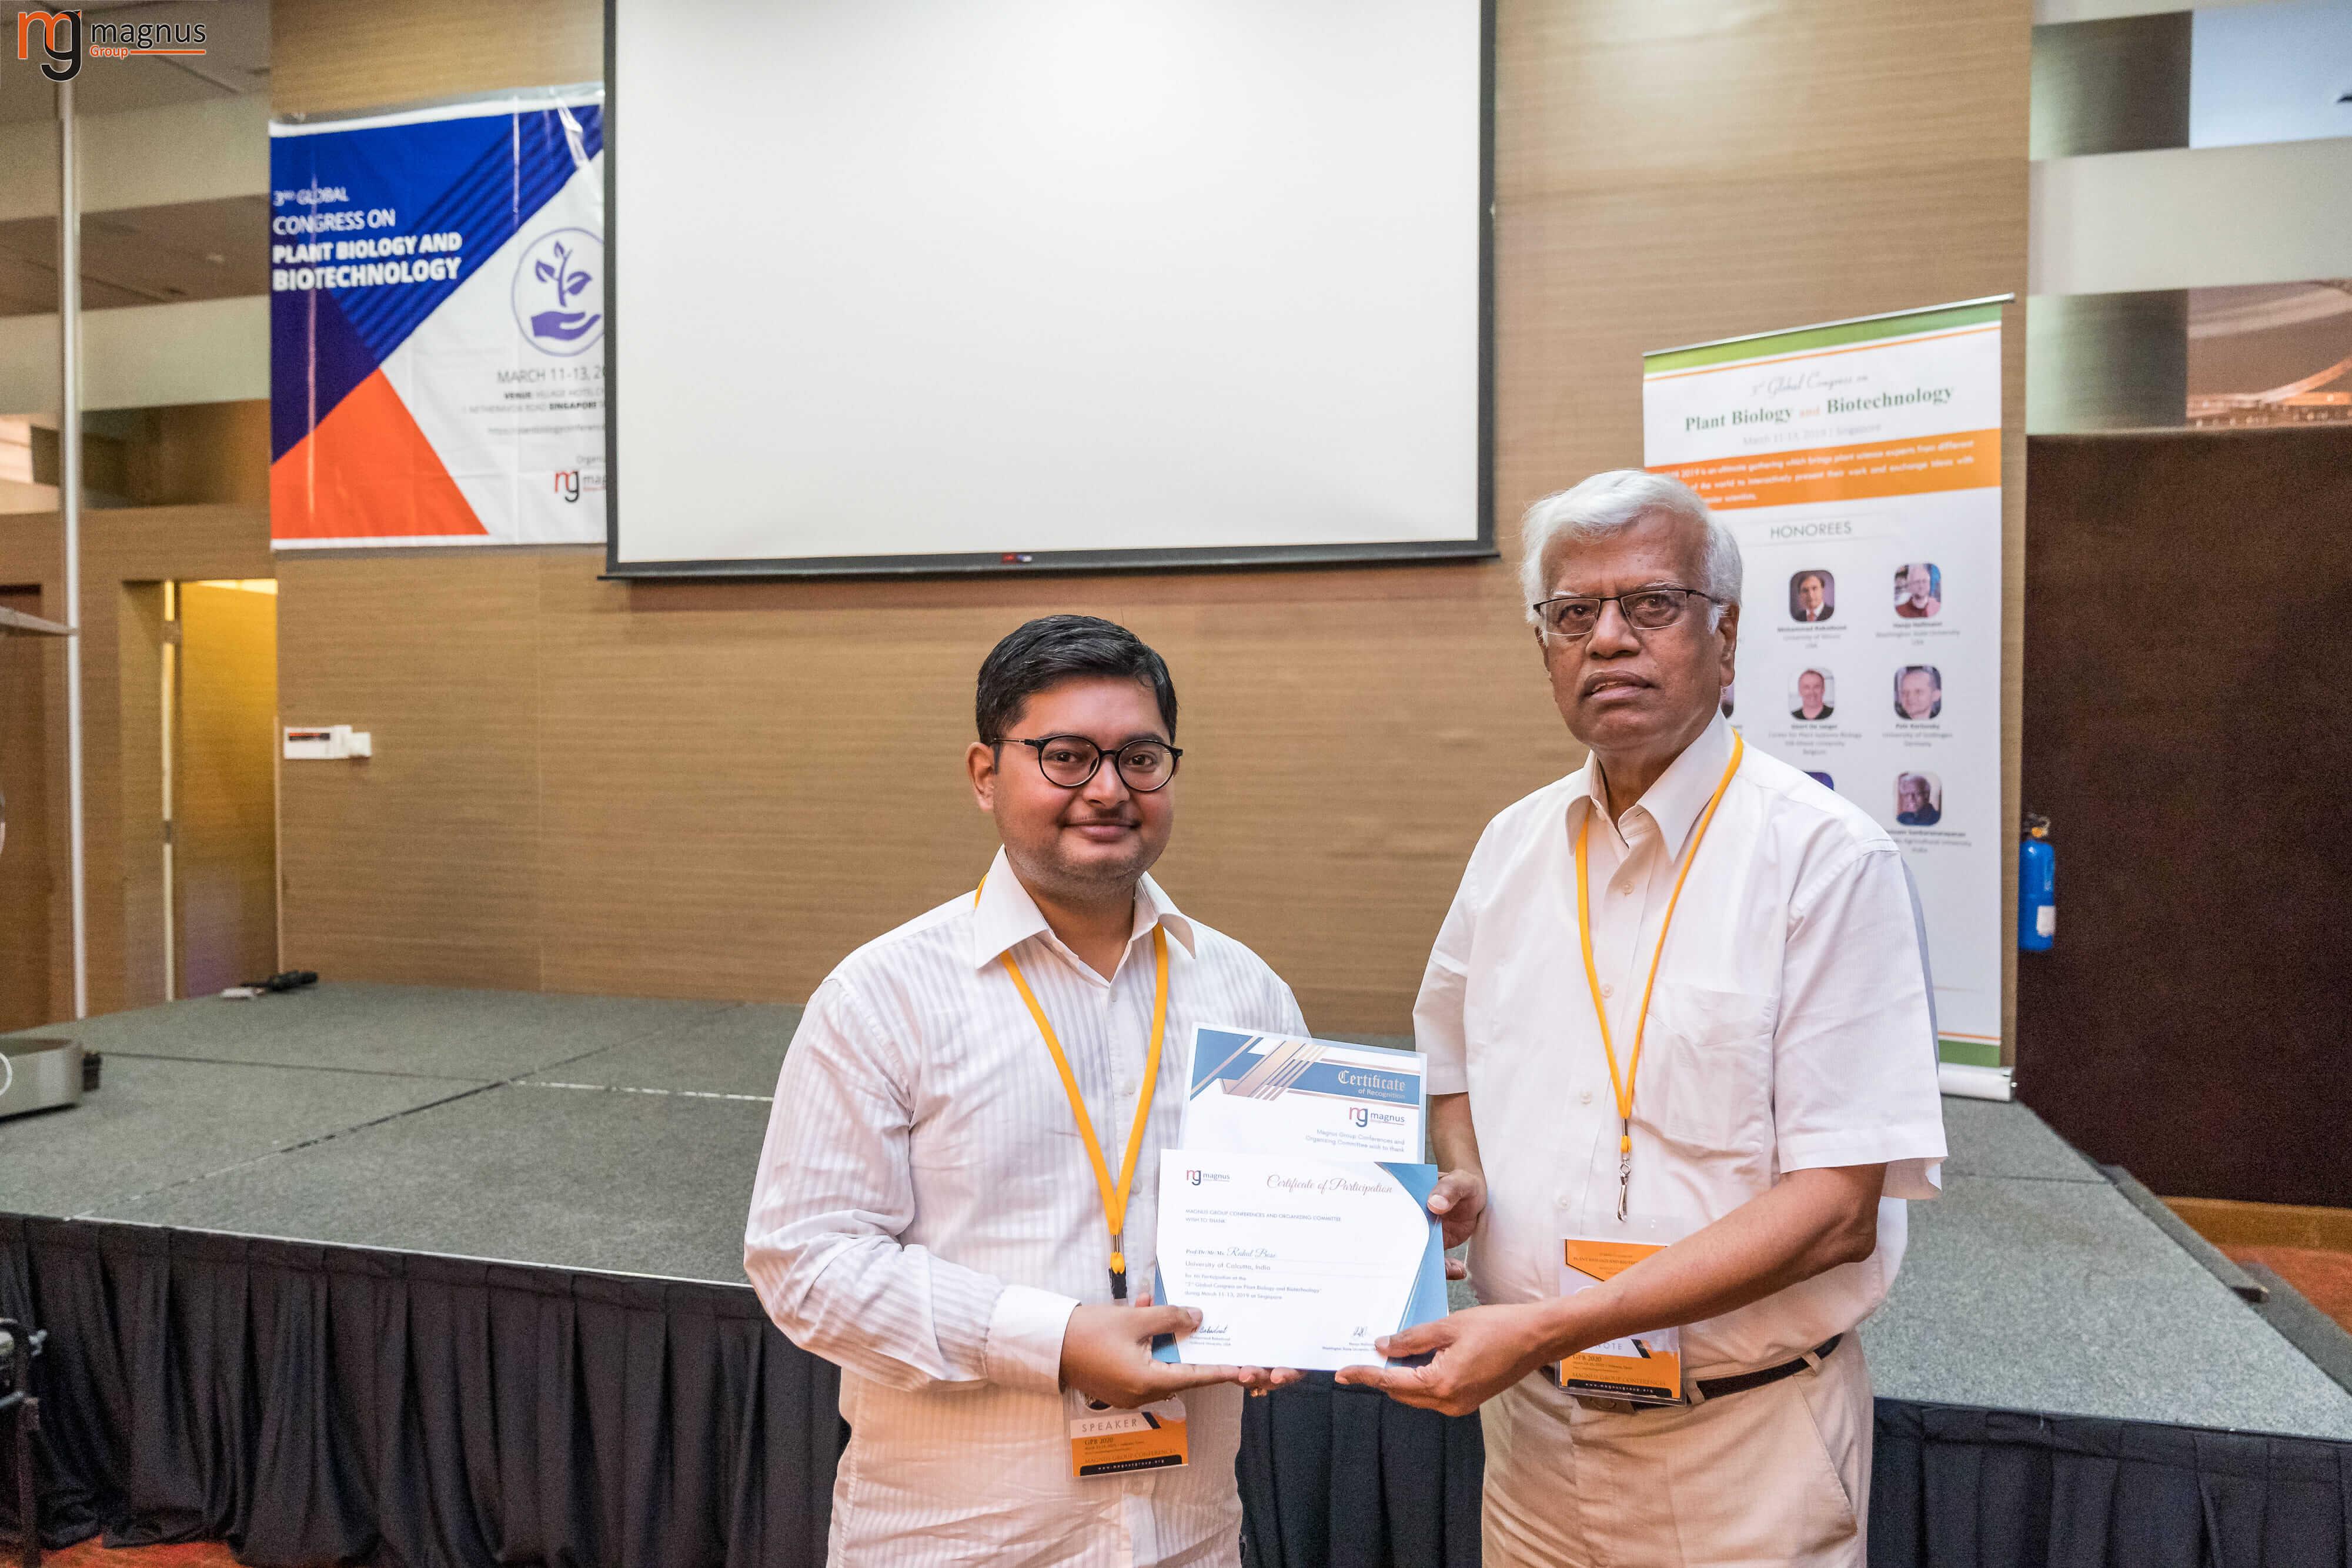 Plant Biotechnology Conferences 2019